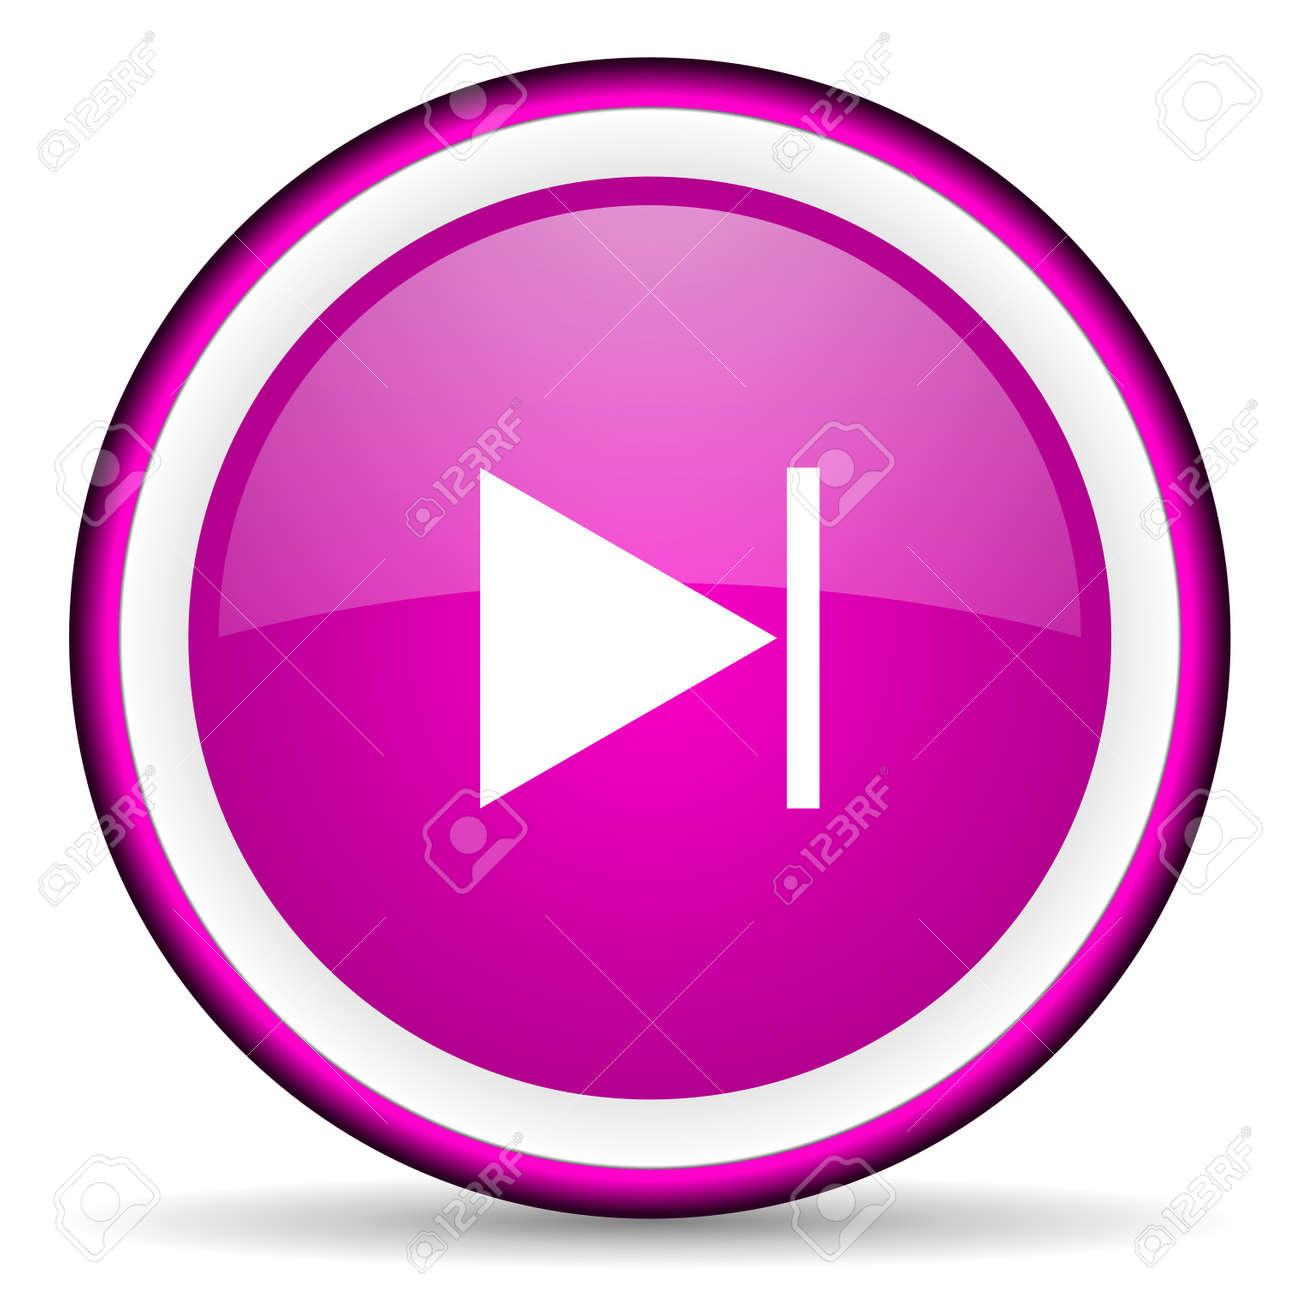 next violet glossy icon on white background Stock Photo - 16679106